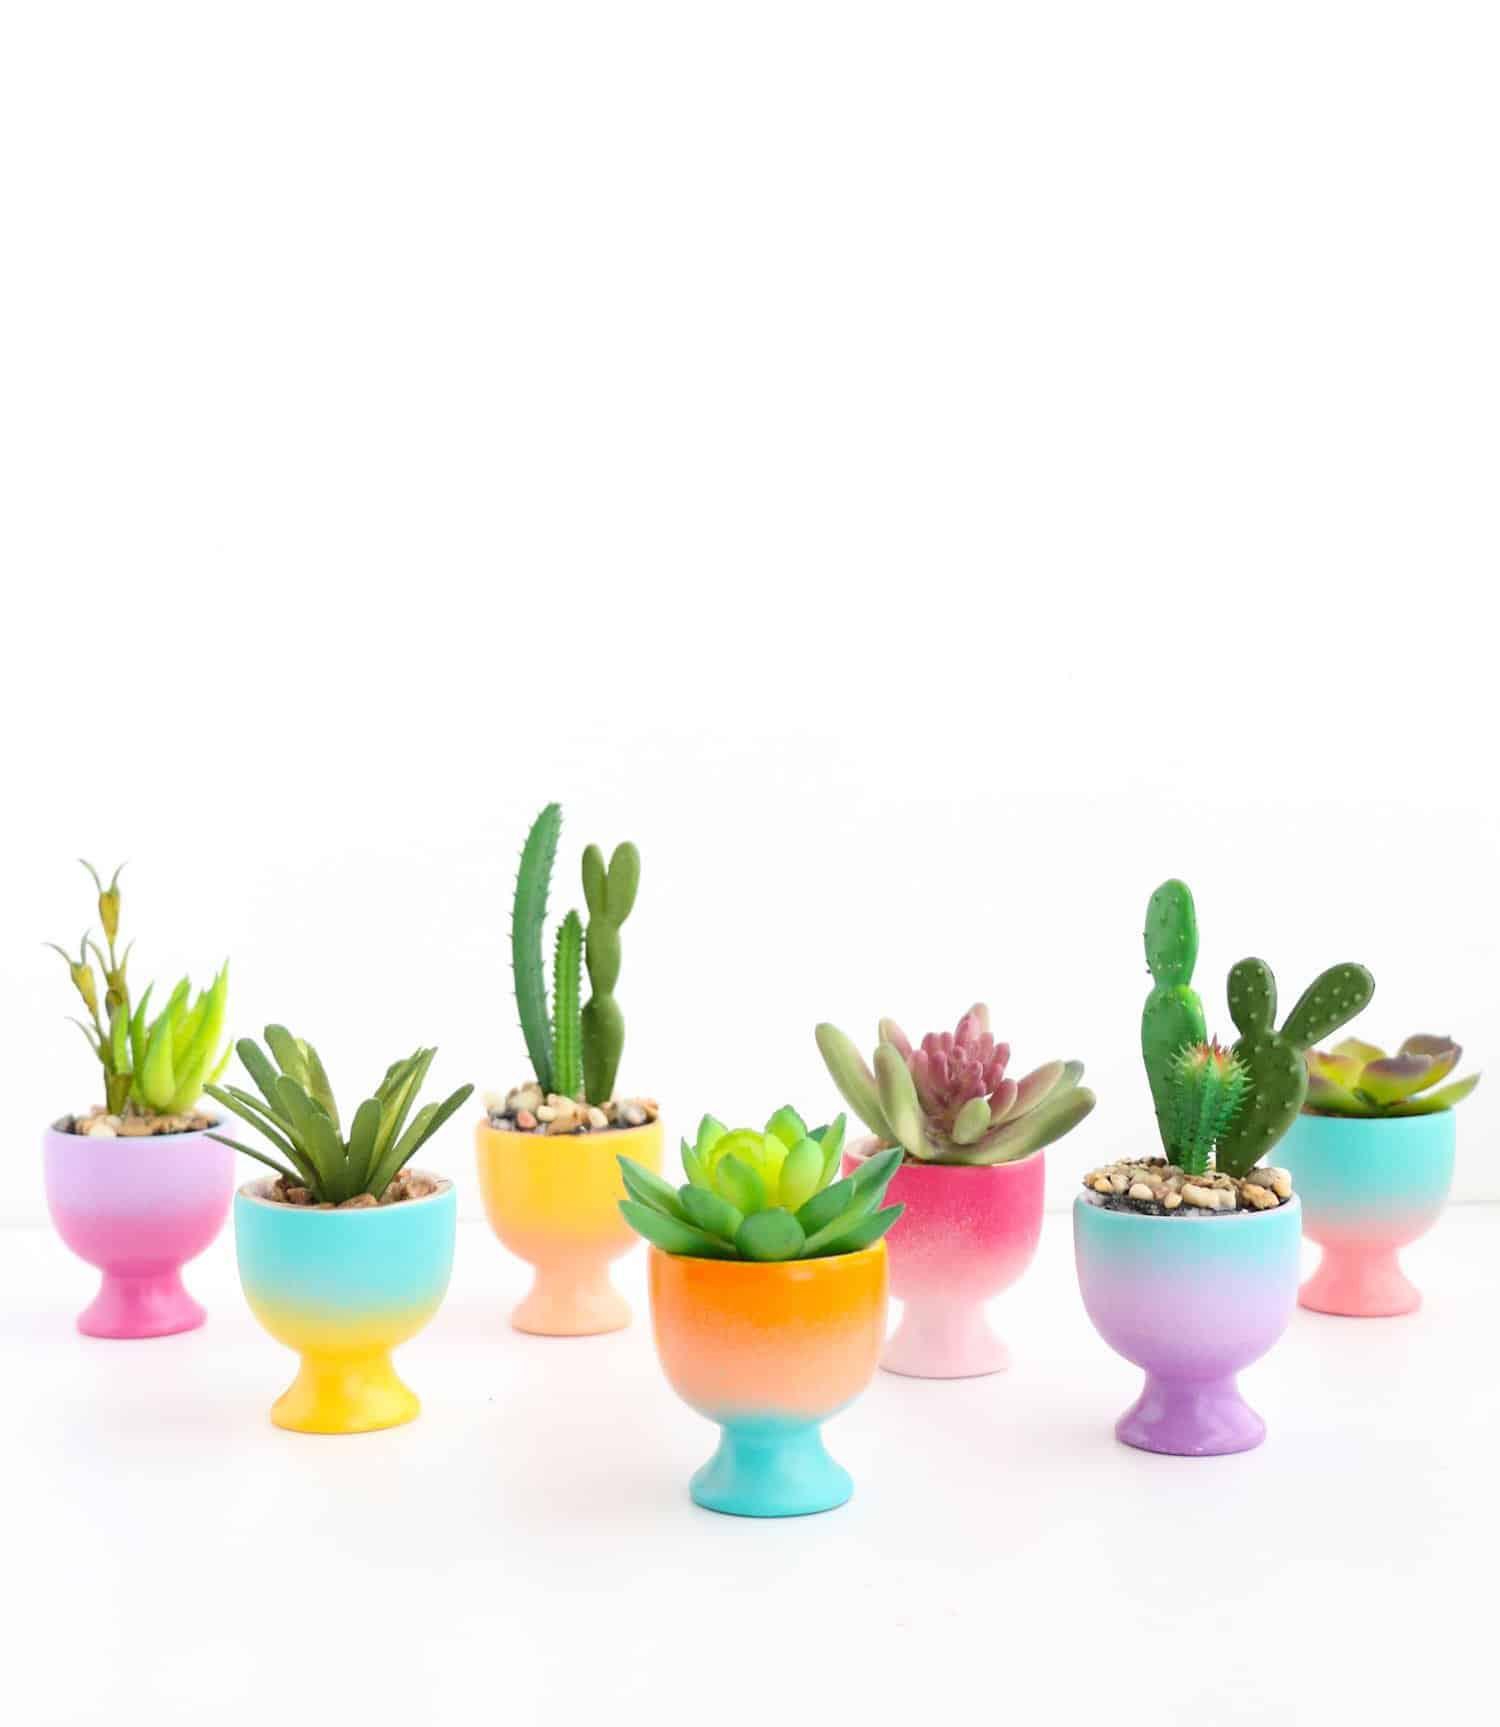 DIY mini gradient egg cup planter